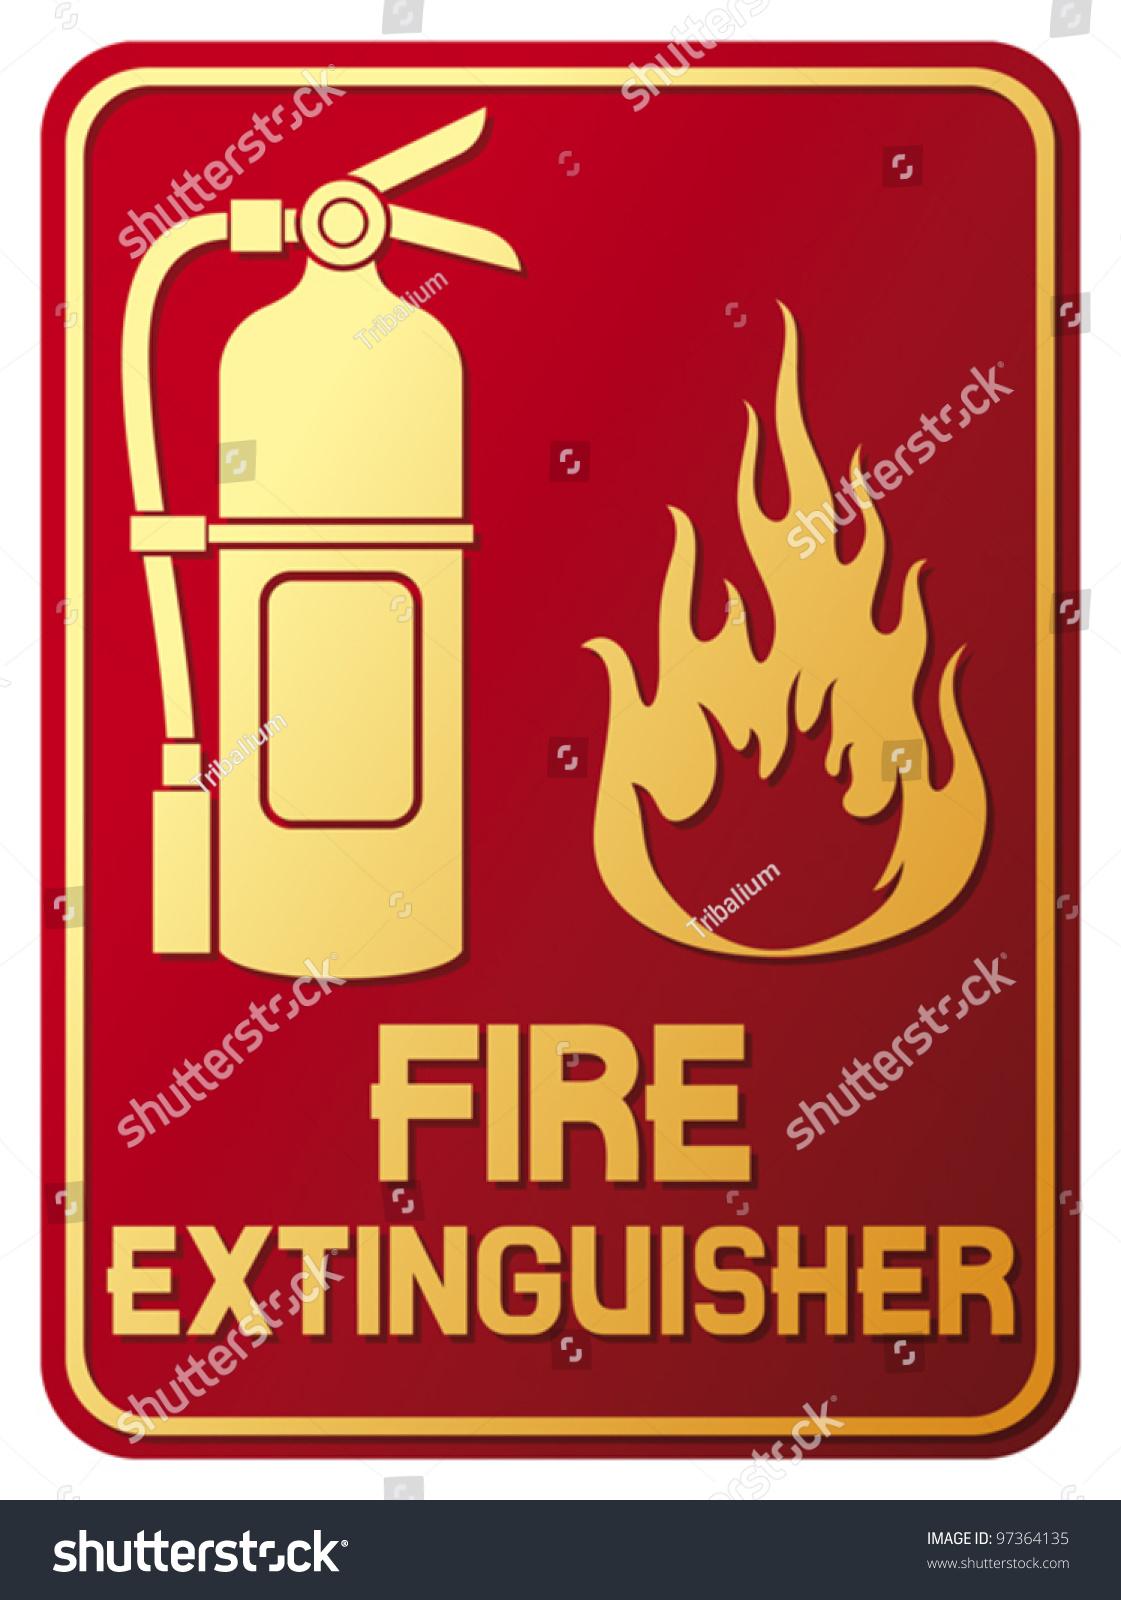 fire extinguisher sign stock vector illustration 97364135